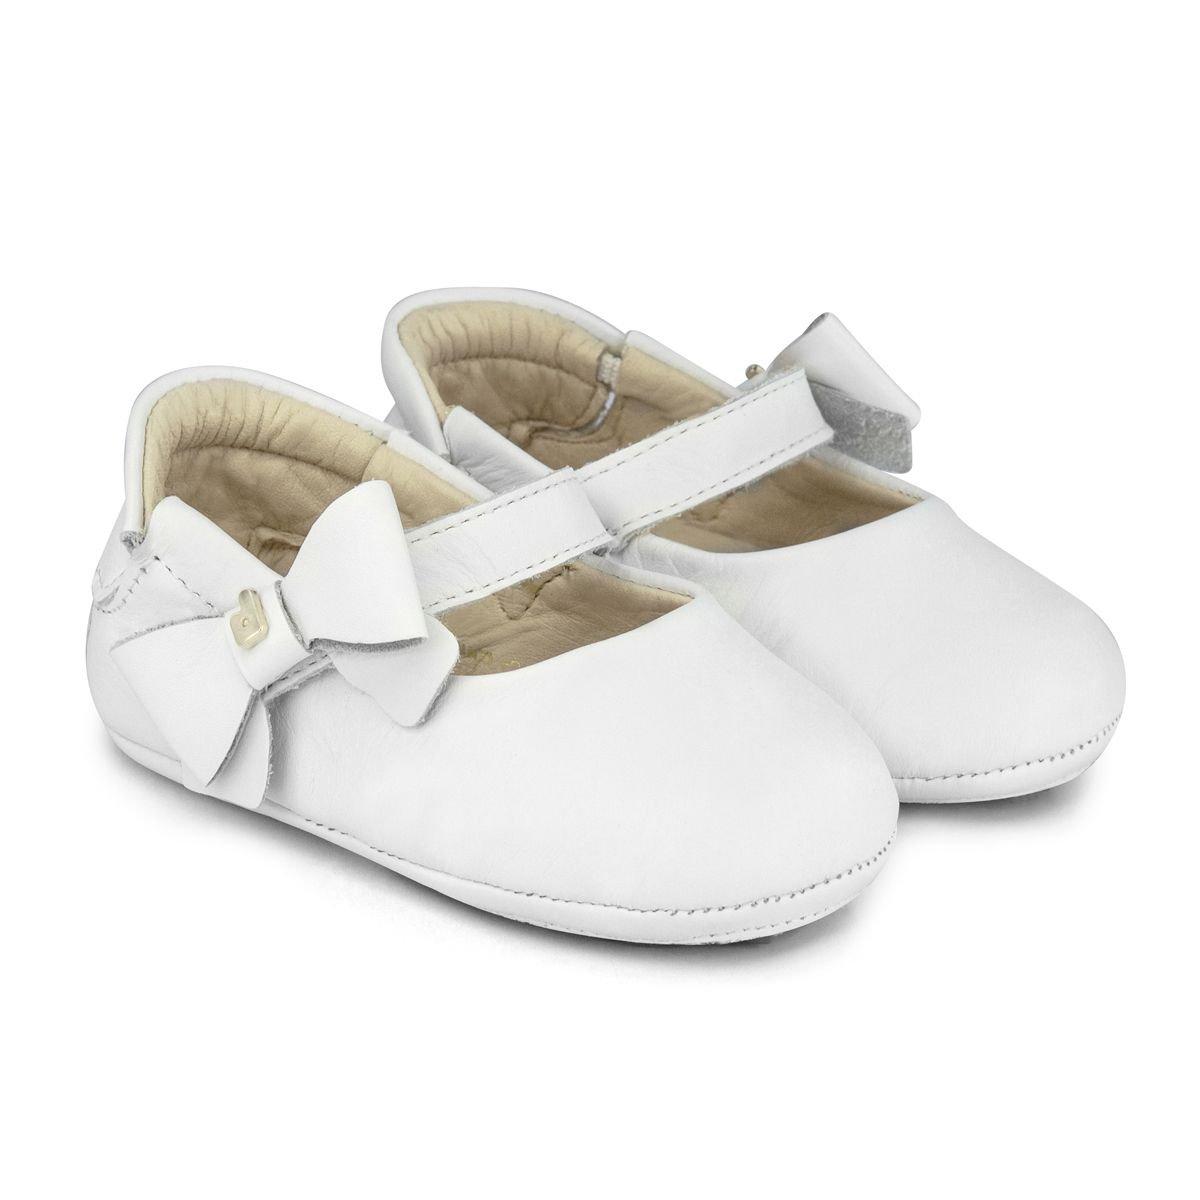 Balerini cu funda Bibi Shoes Afeto, Alb imagine